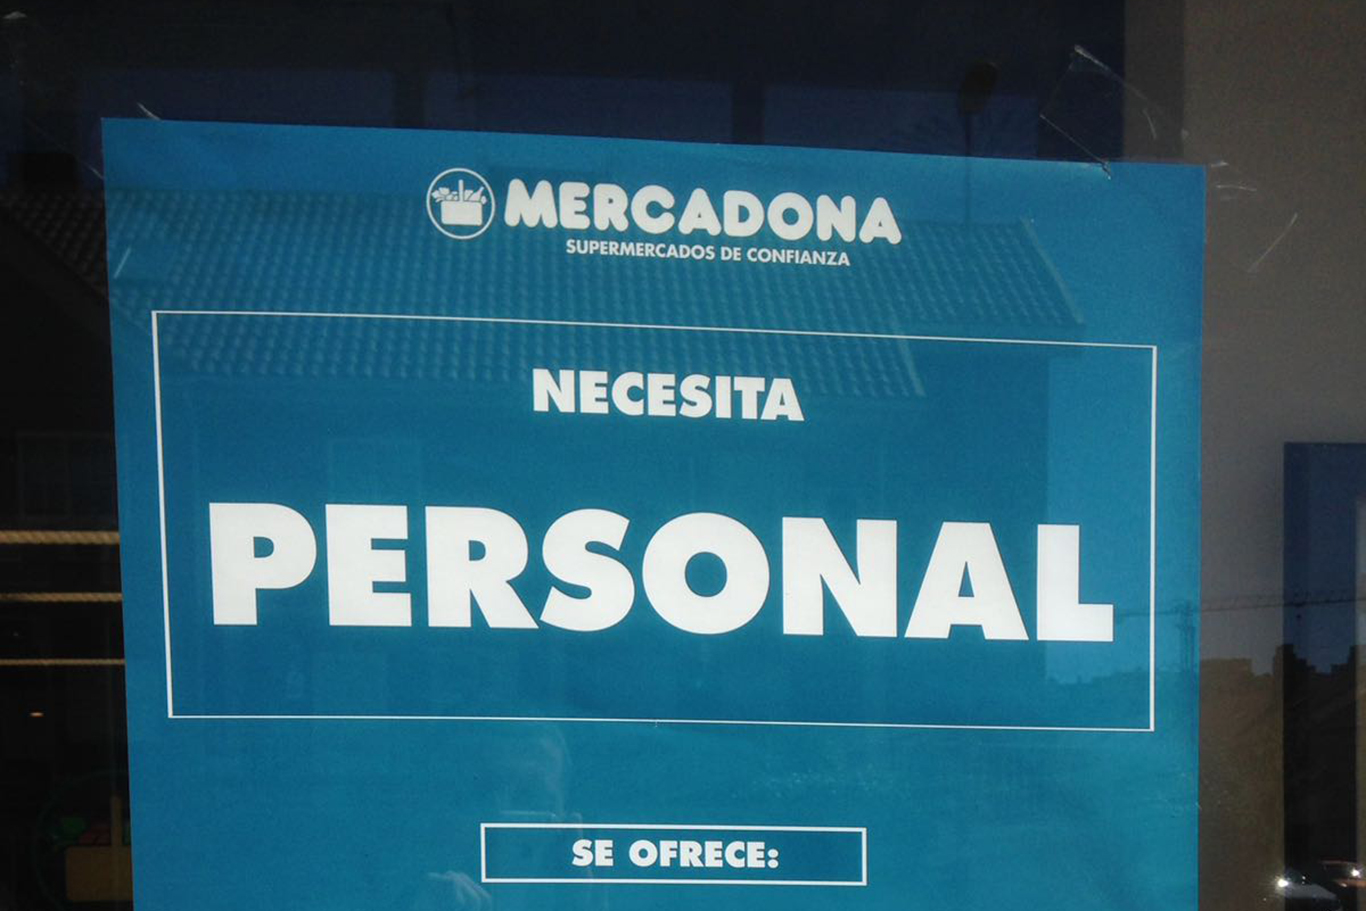 Mercadona busca personal, mándales tu curriculum - Dream Alcalá